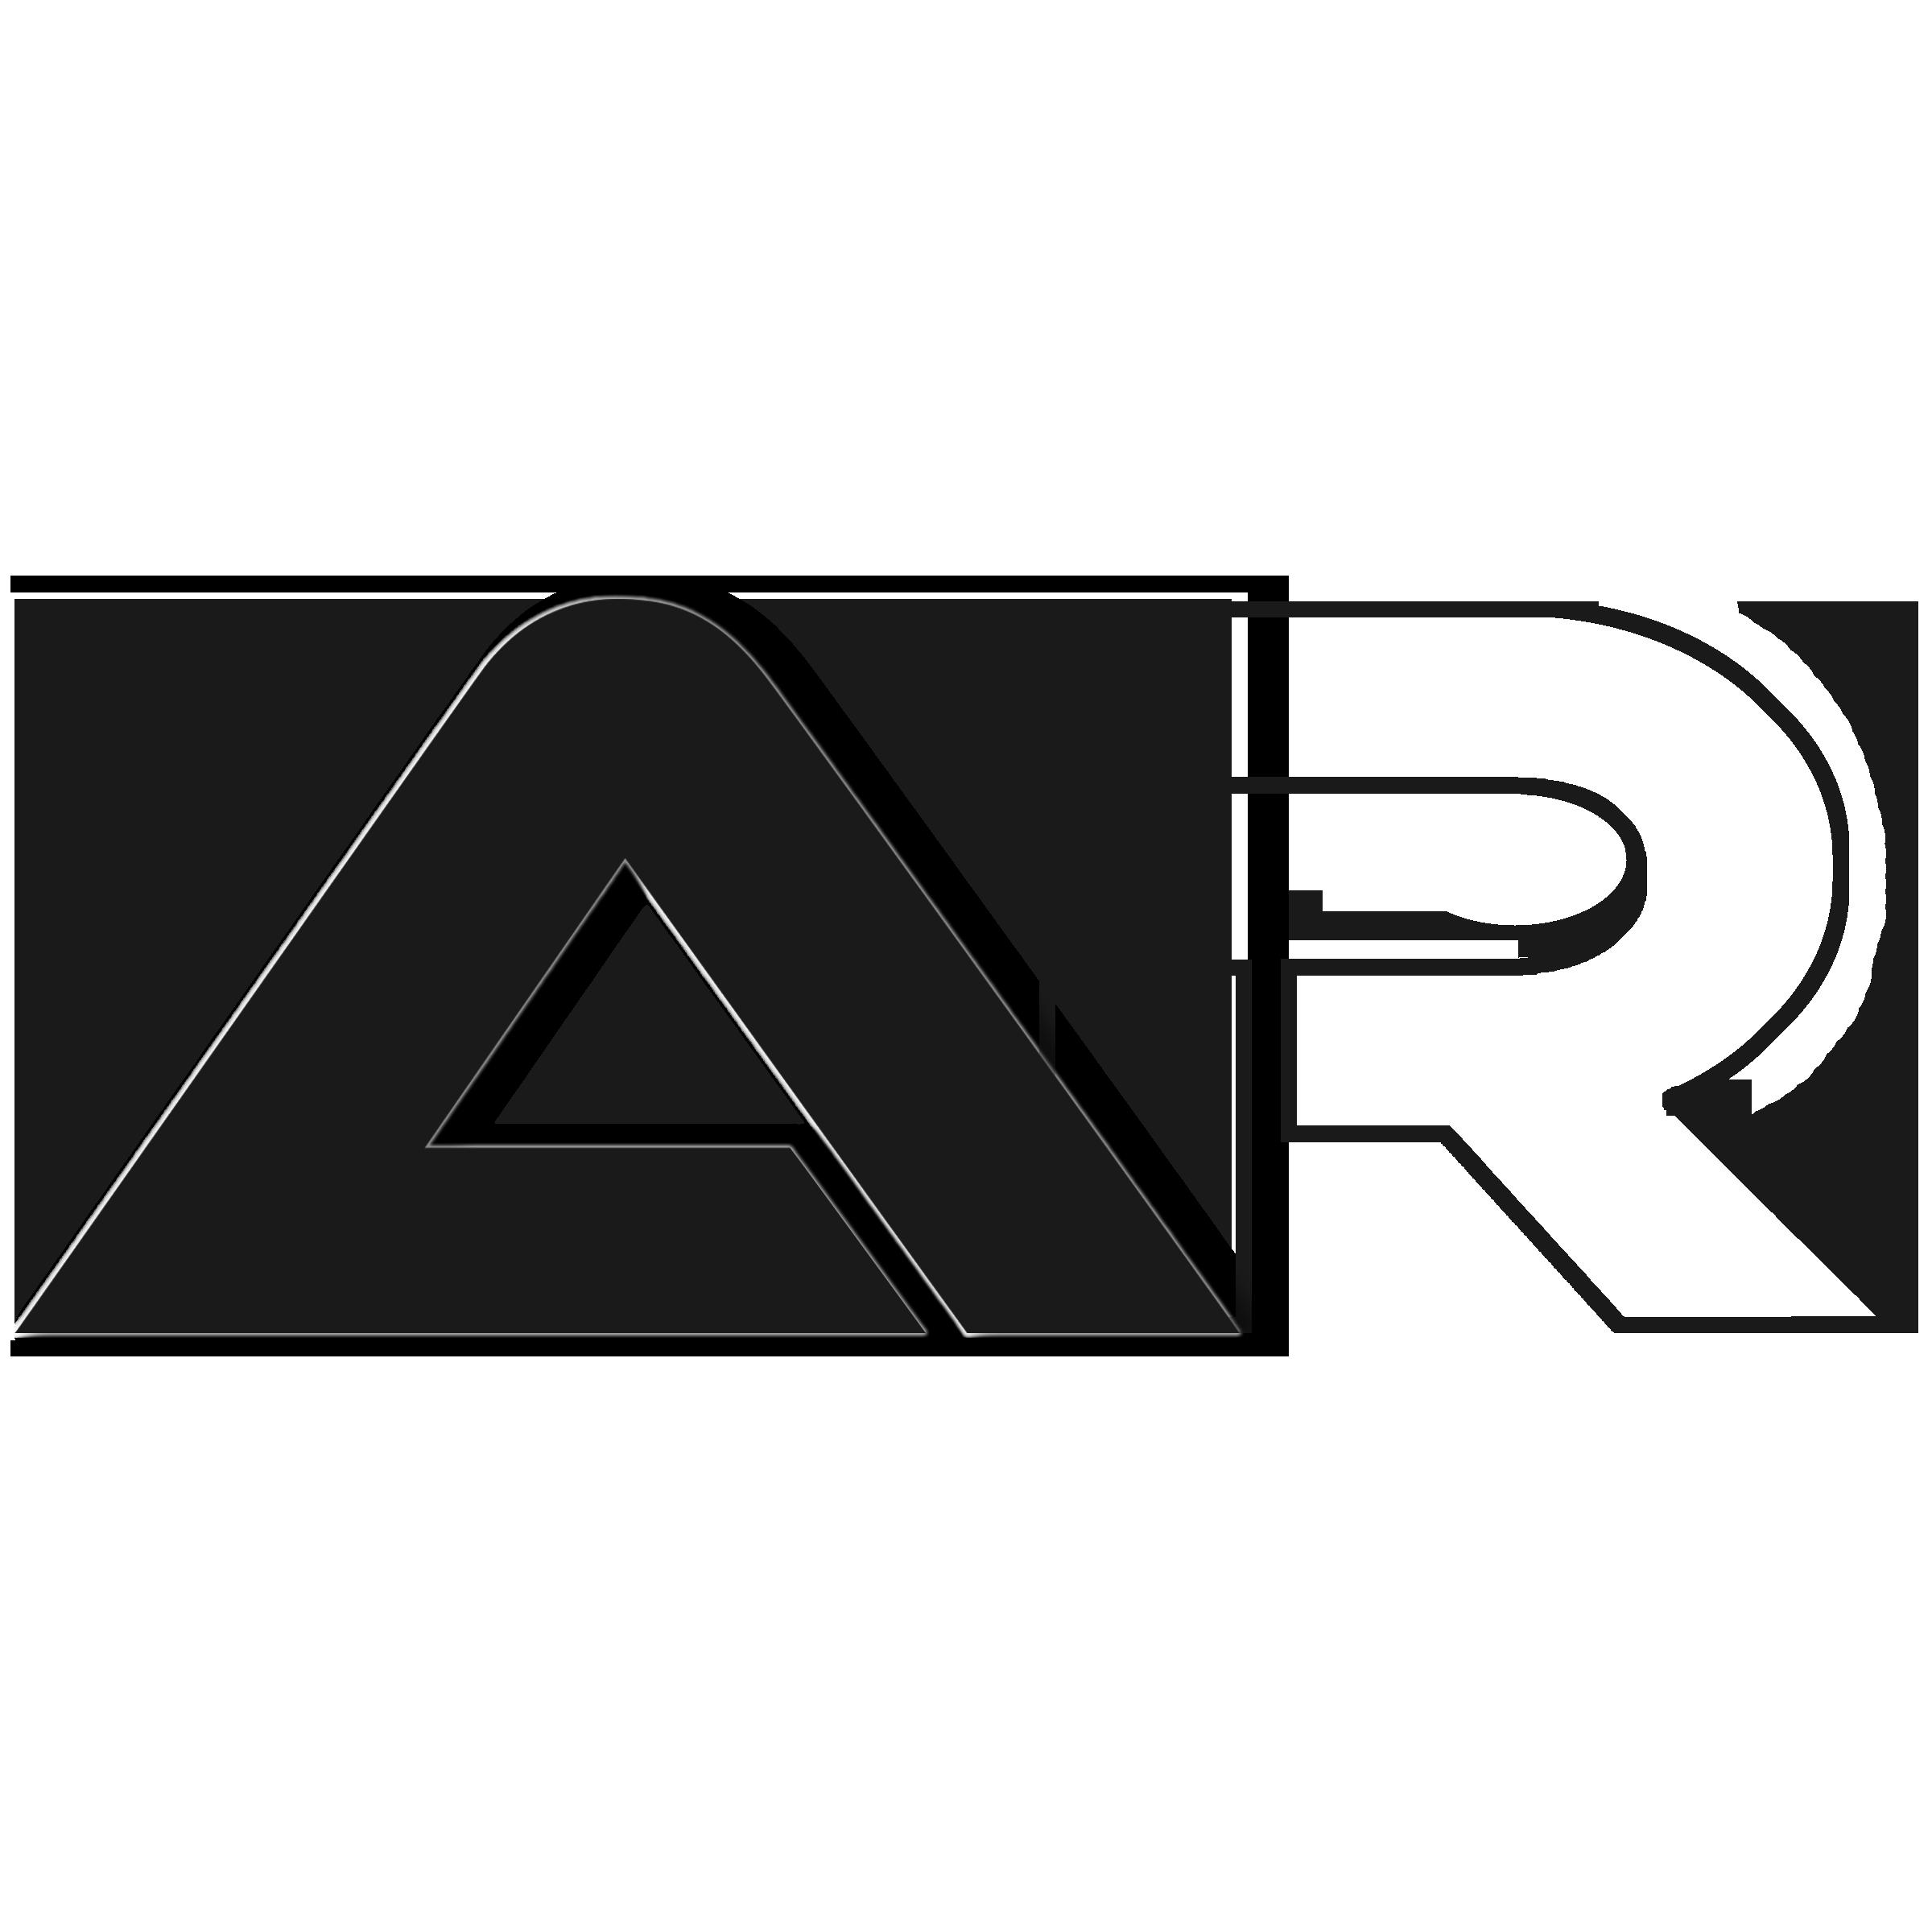 Aerial Image Revolution Ltd